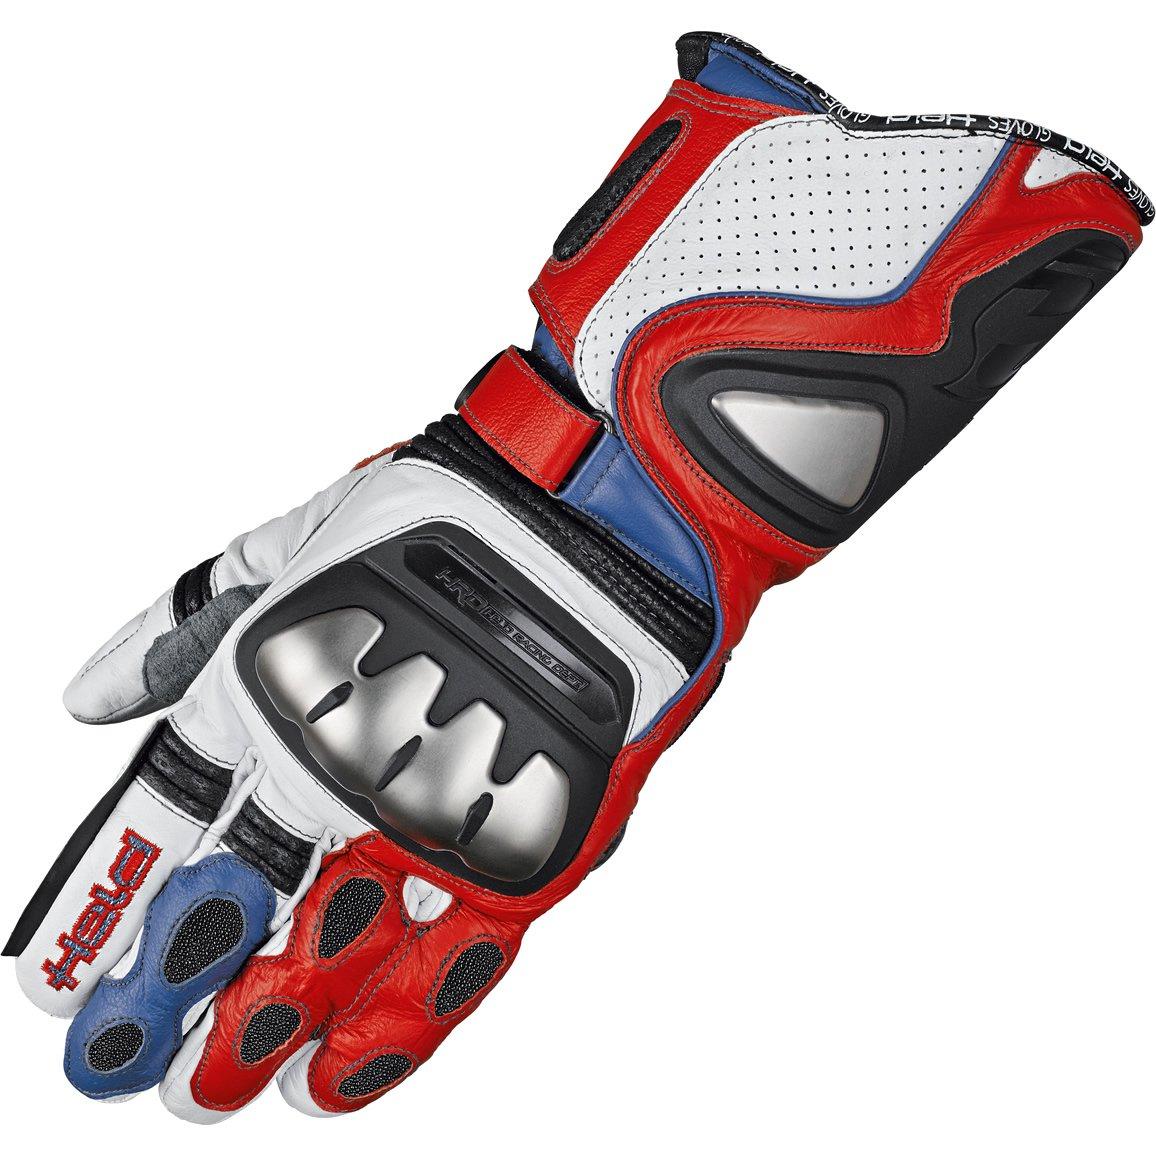 Held Titan Evo Motorradsporthandschuh Gr/ö/ße 7,5 Farbe rot-weiss